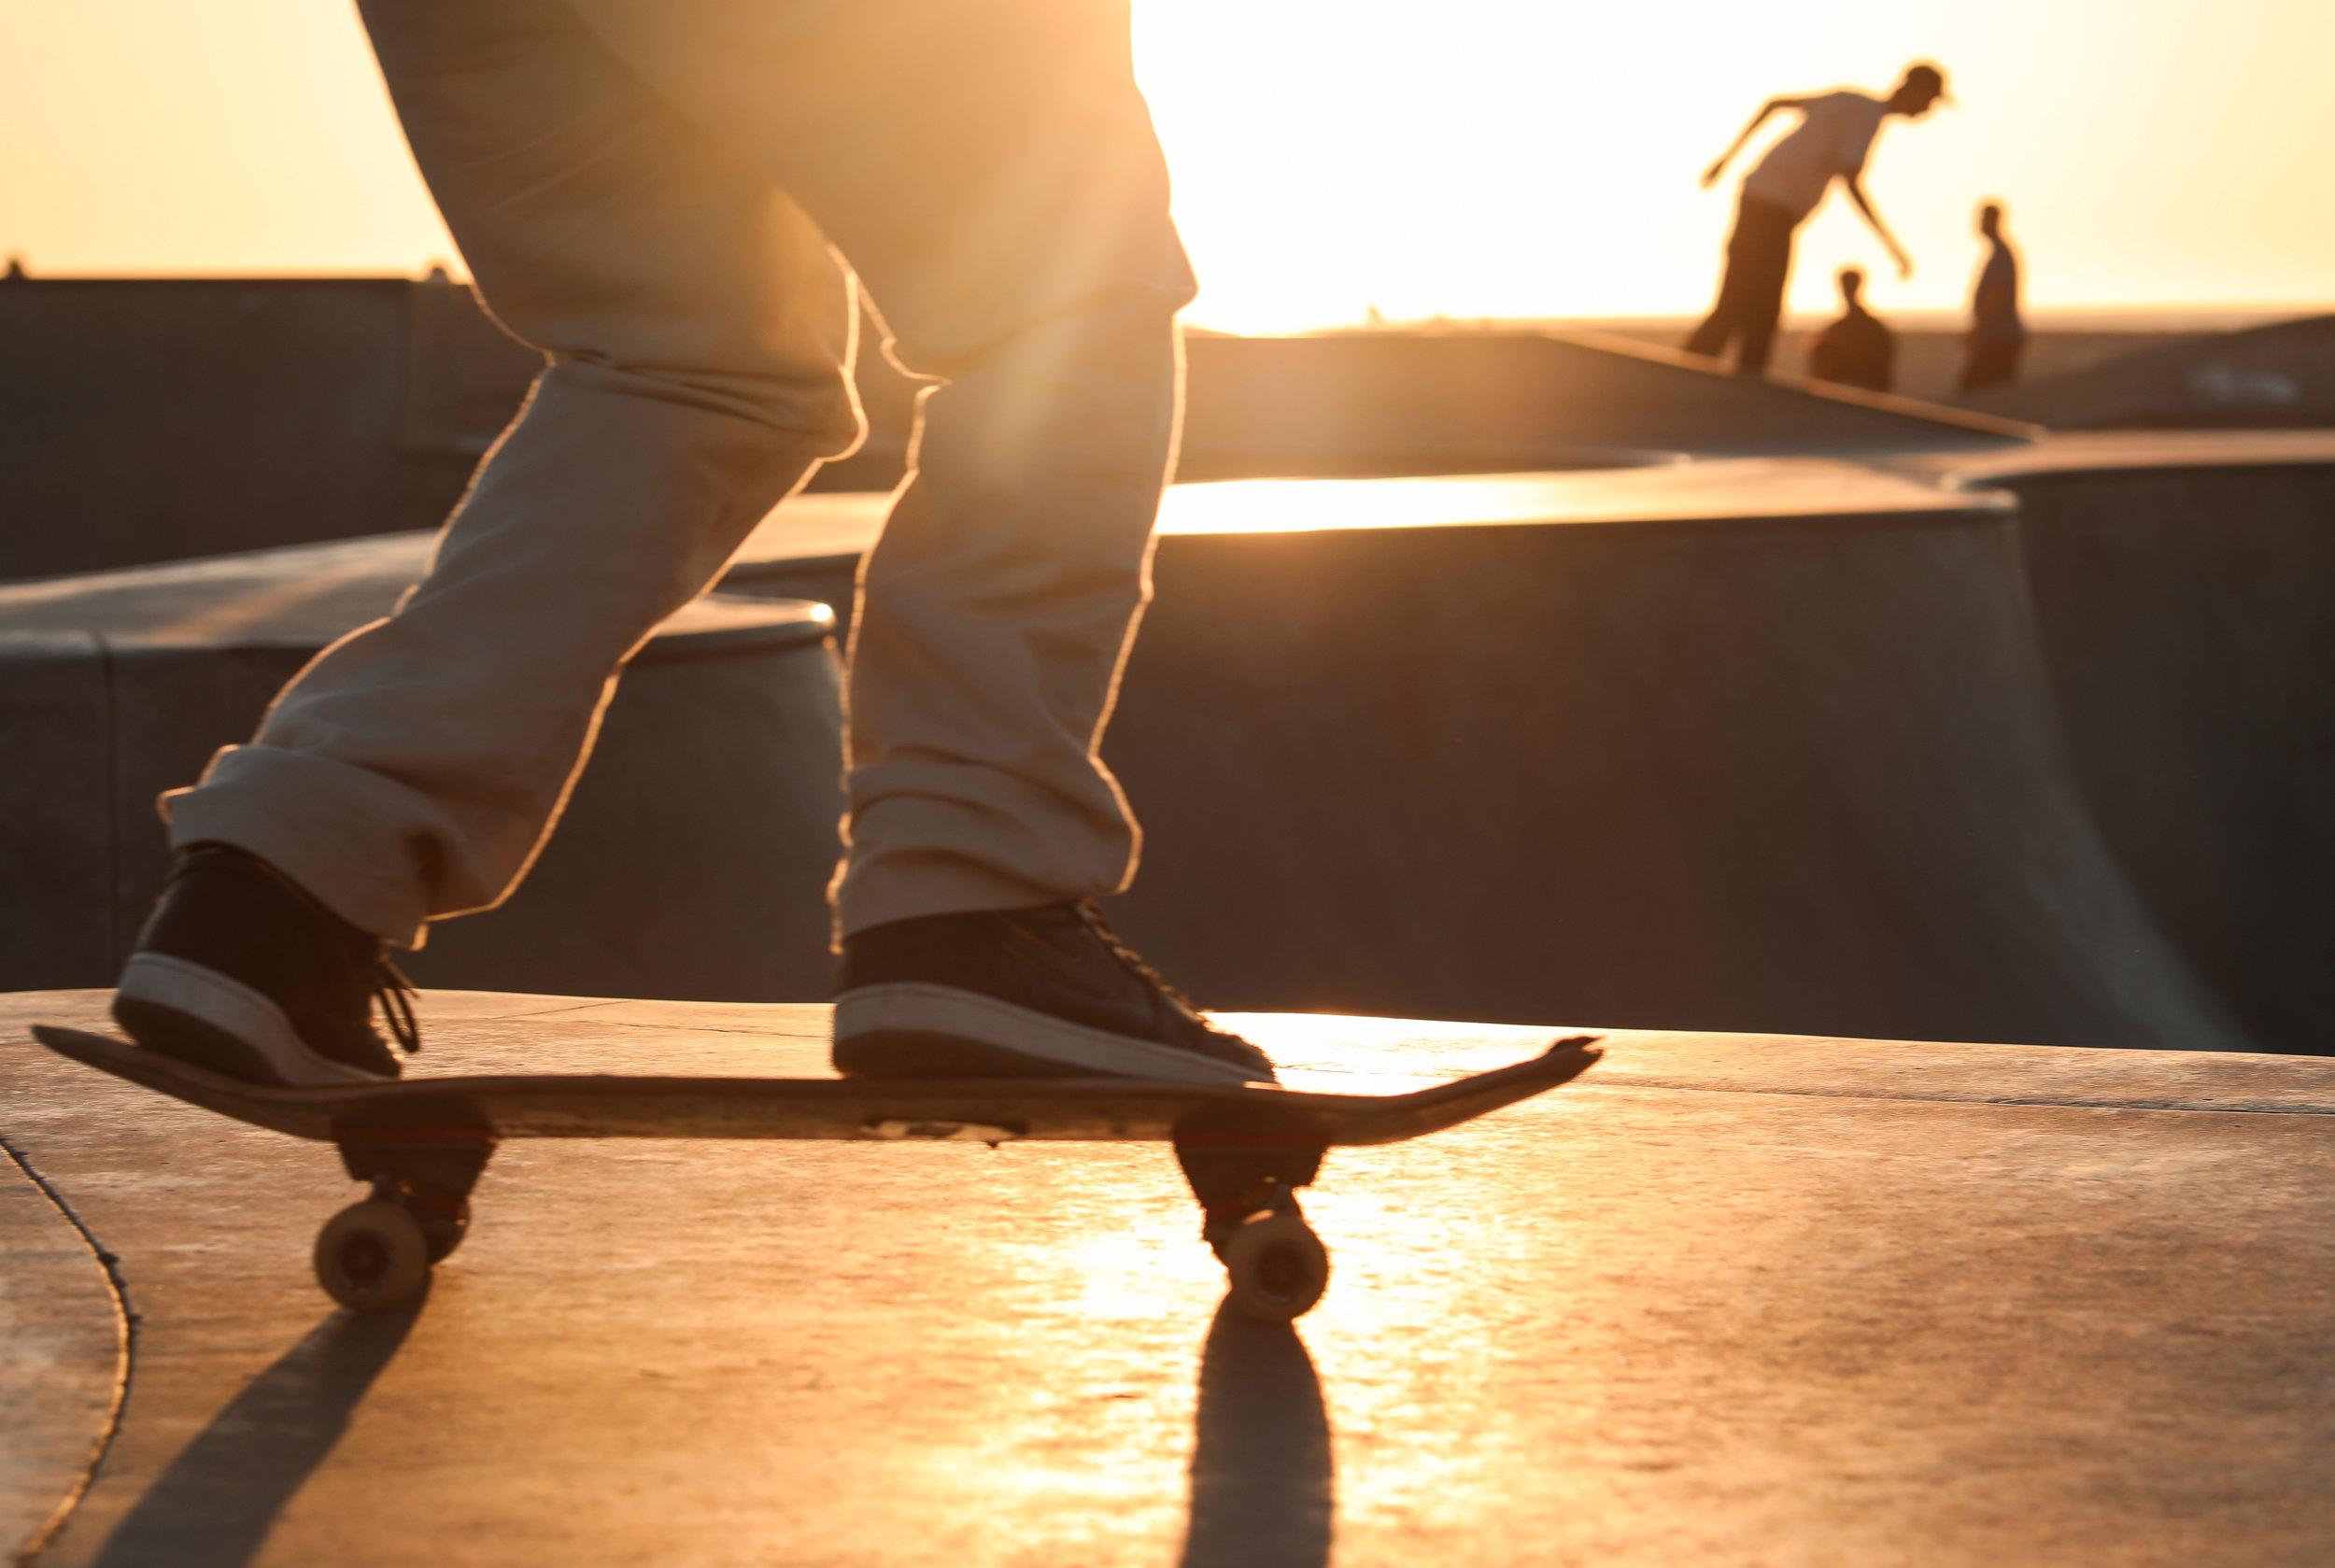 Venice_skate-1.jpg